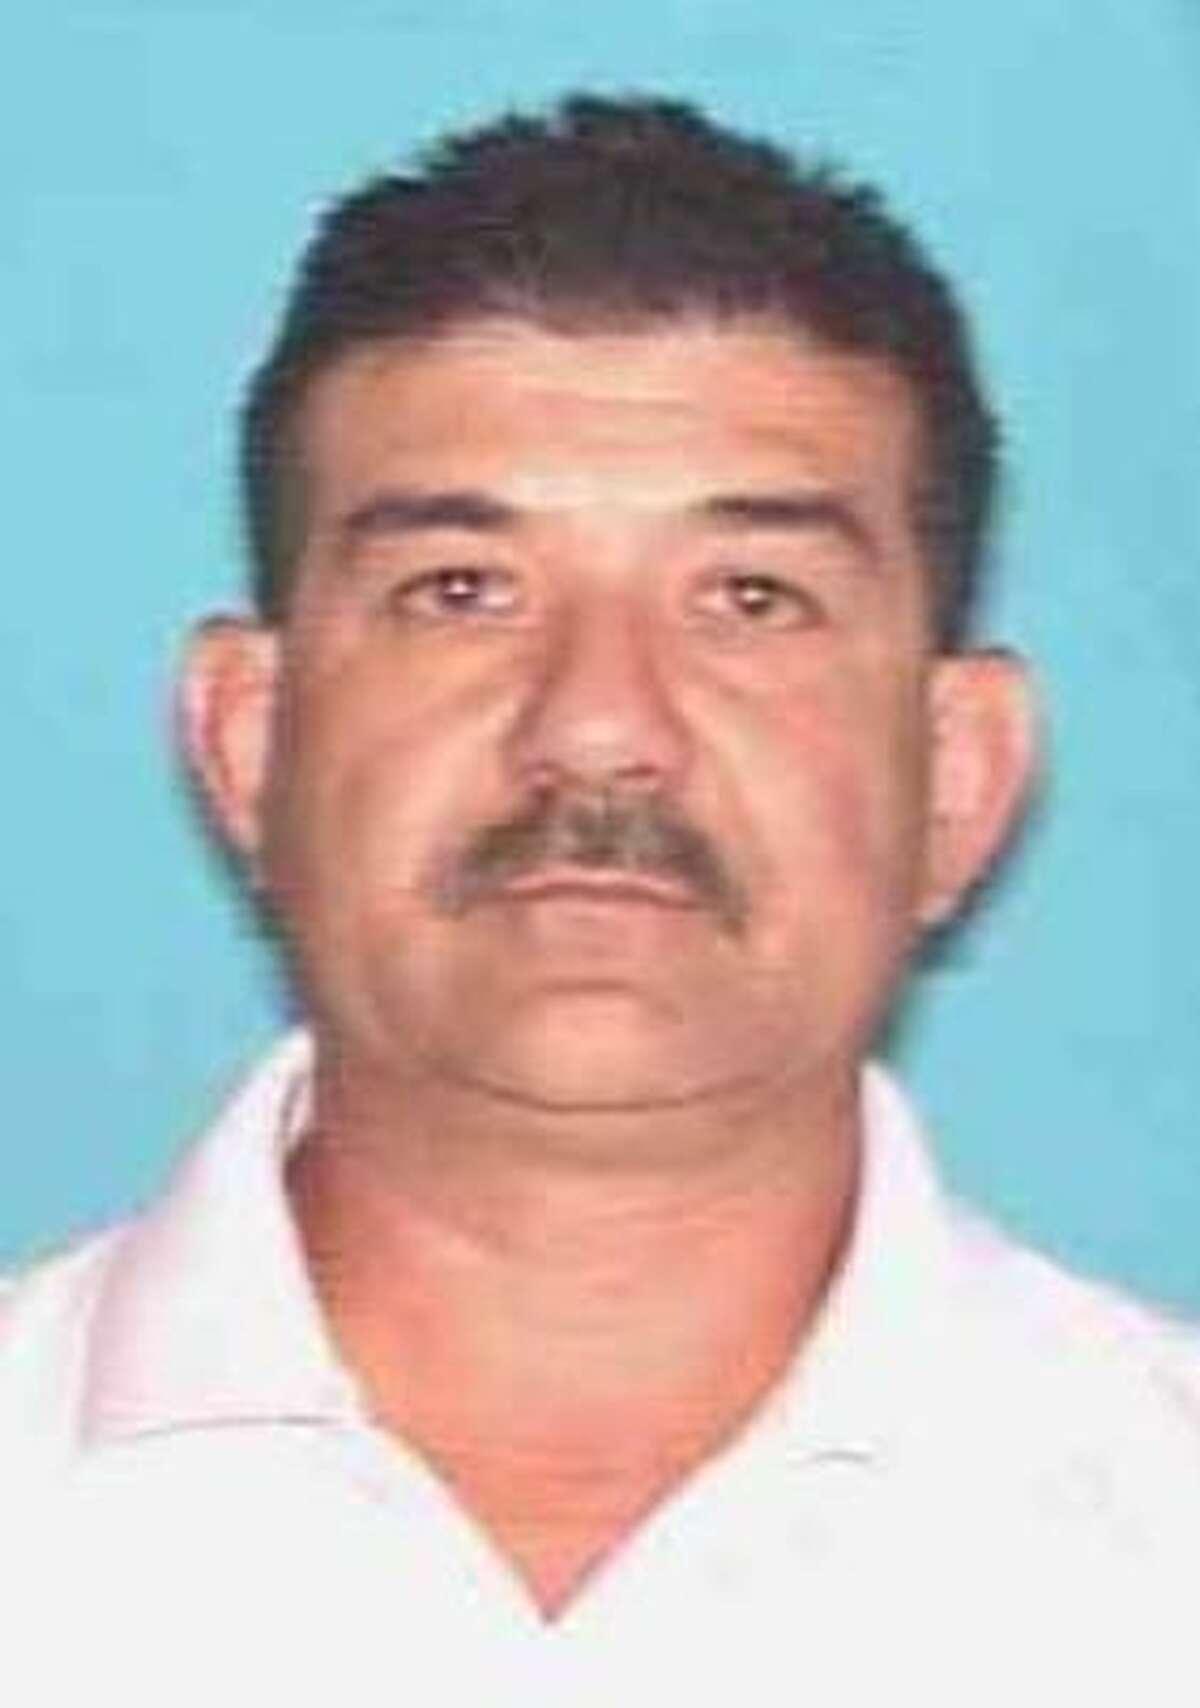 Salvador Rojas was last heard from Wednesday night.